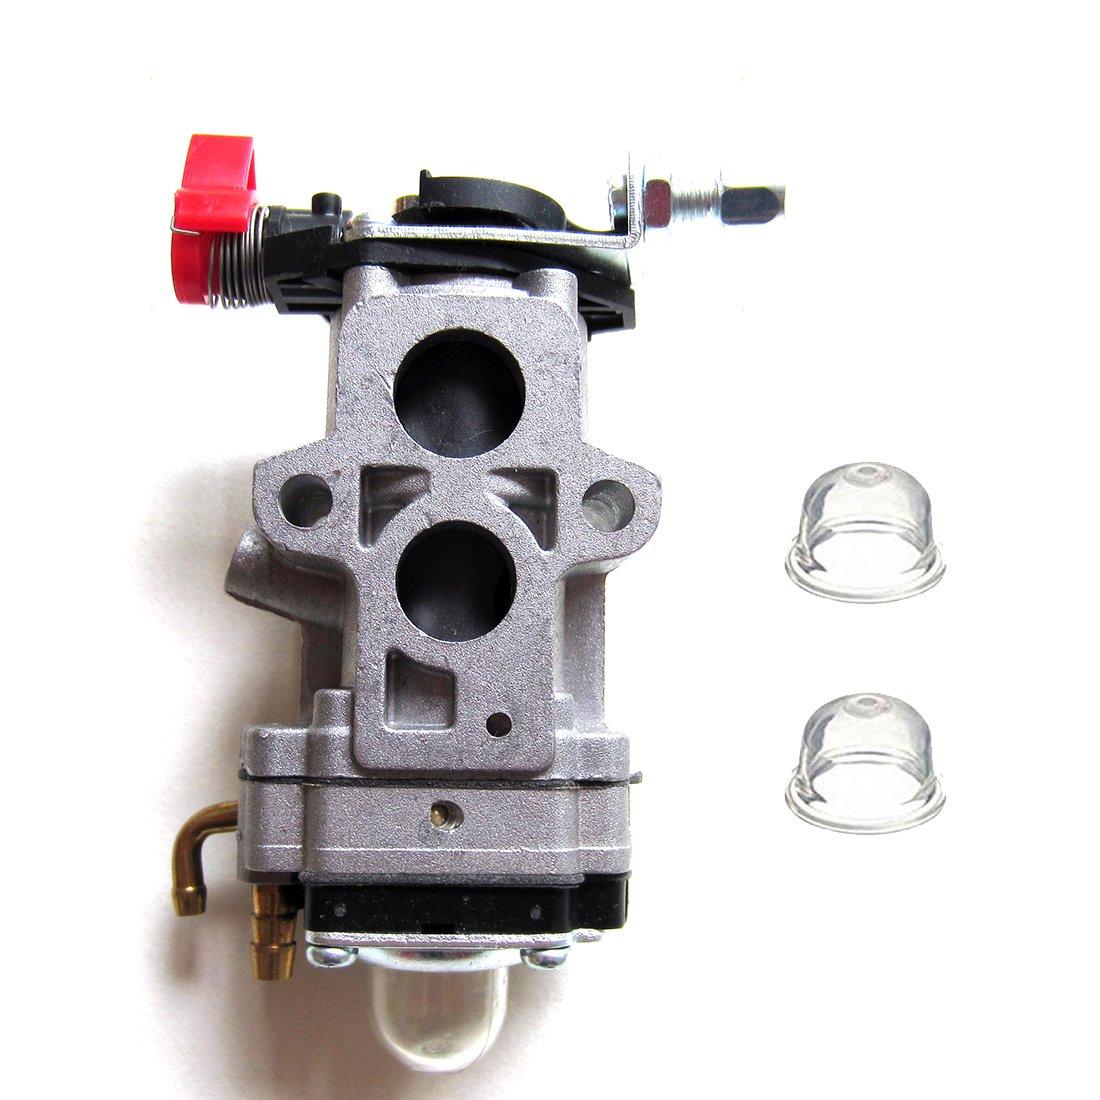 Carburetor Fuel Line For Red Max Ebz8000 Ebz8001 Redmax Filter Ebz8050 Ebz8050rh Walbro Wya 44 1 Leaf Blower Backpack 505183101 Garden Outdoor